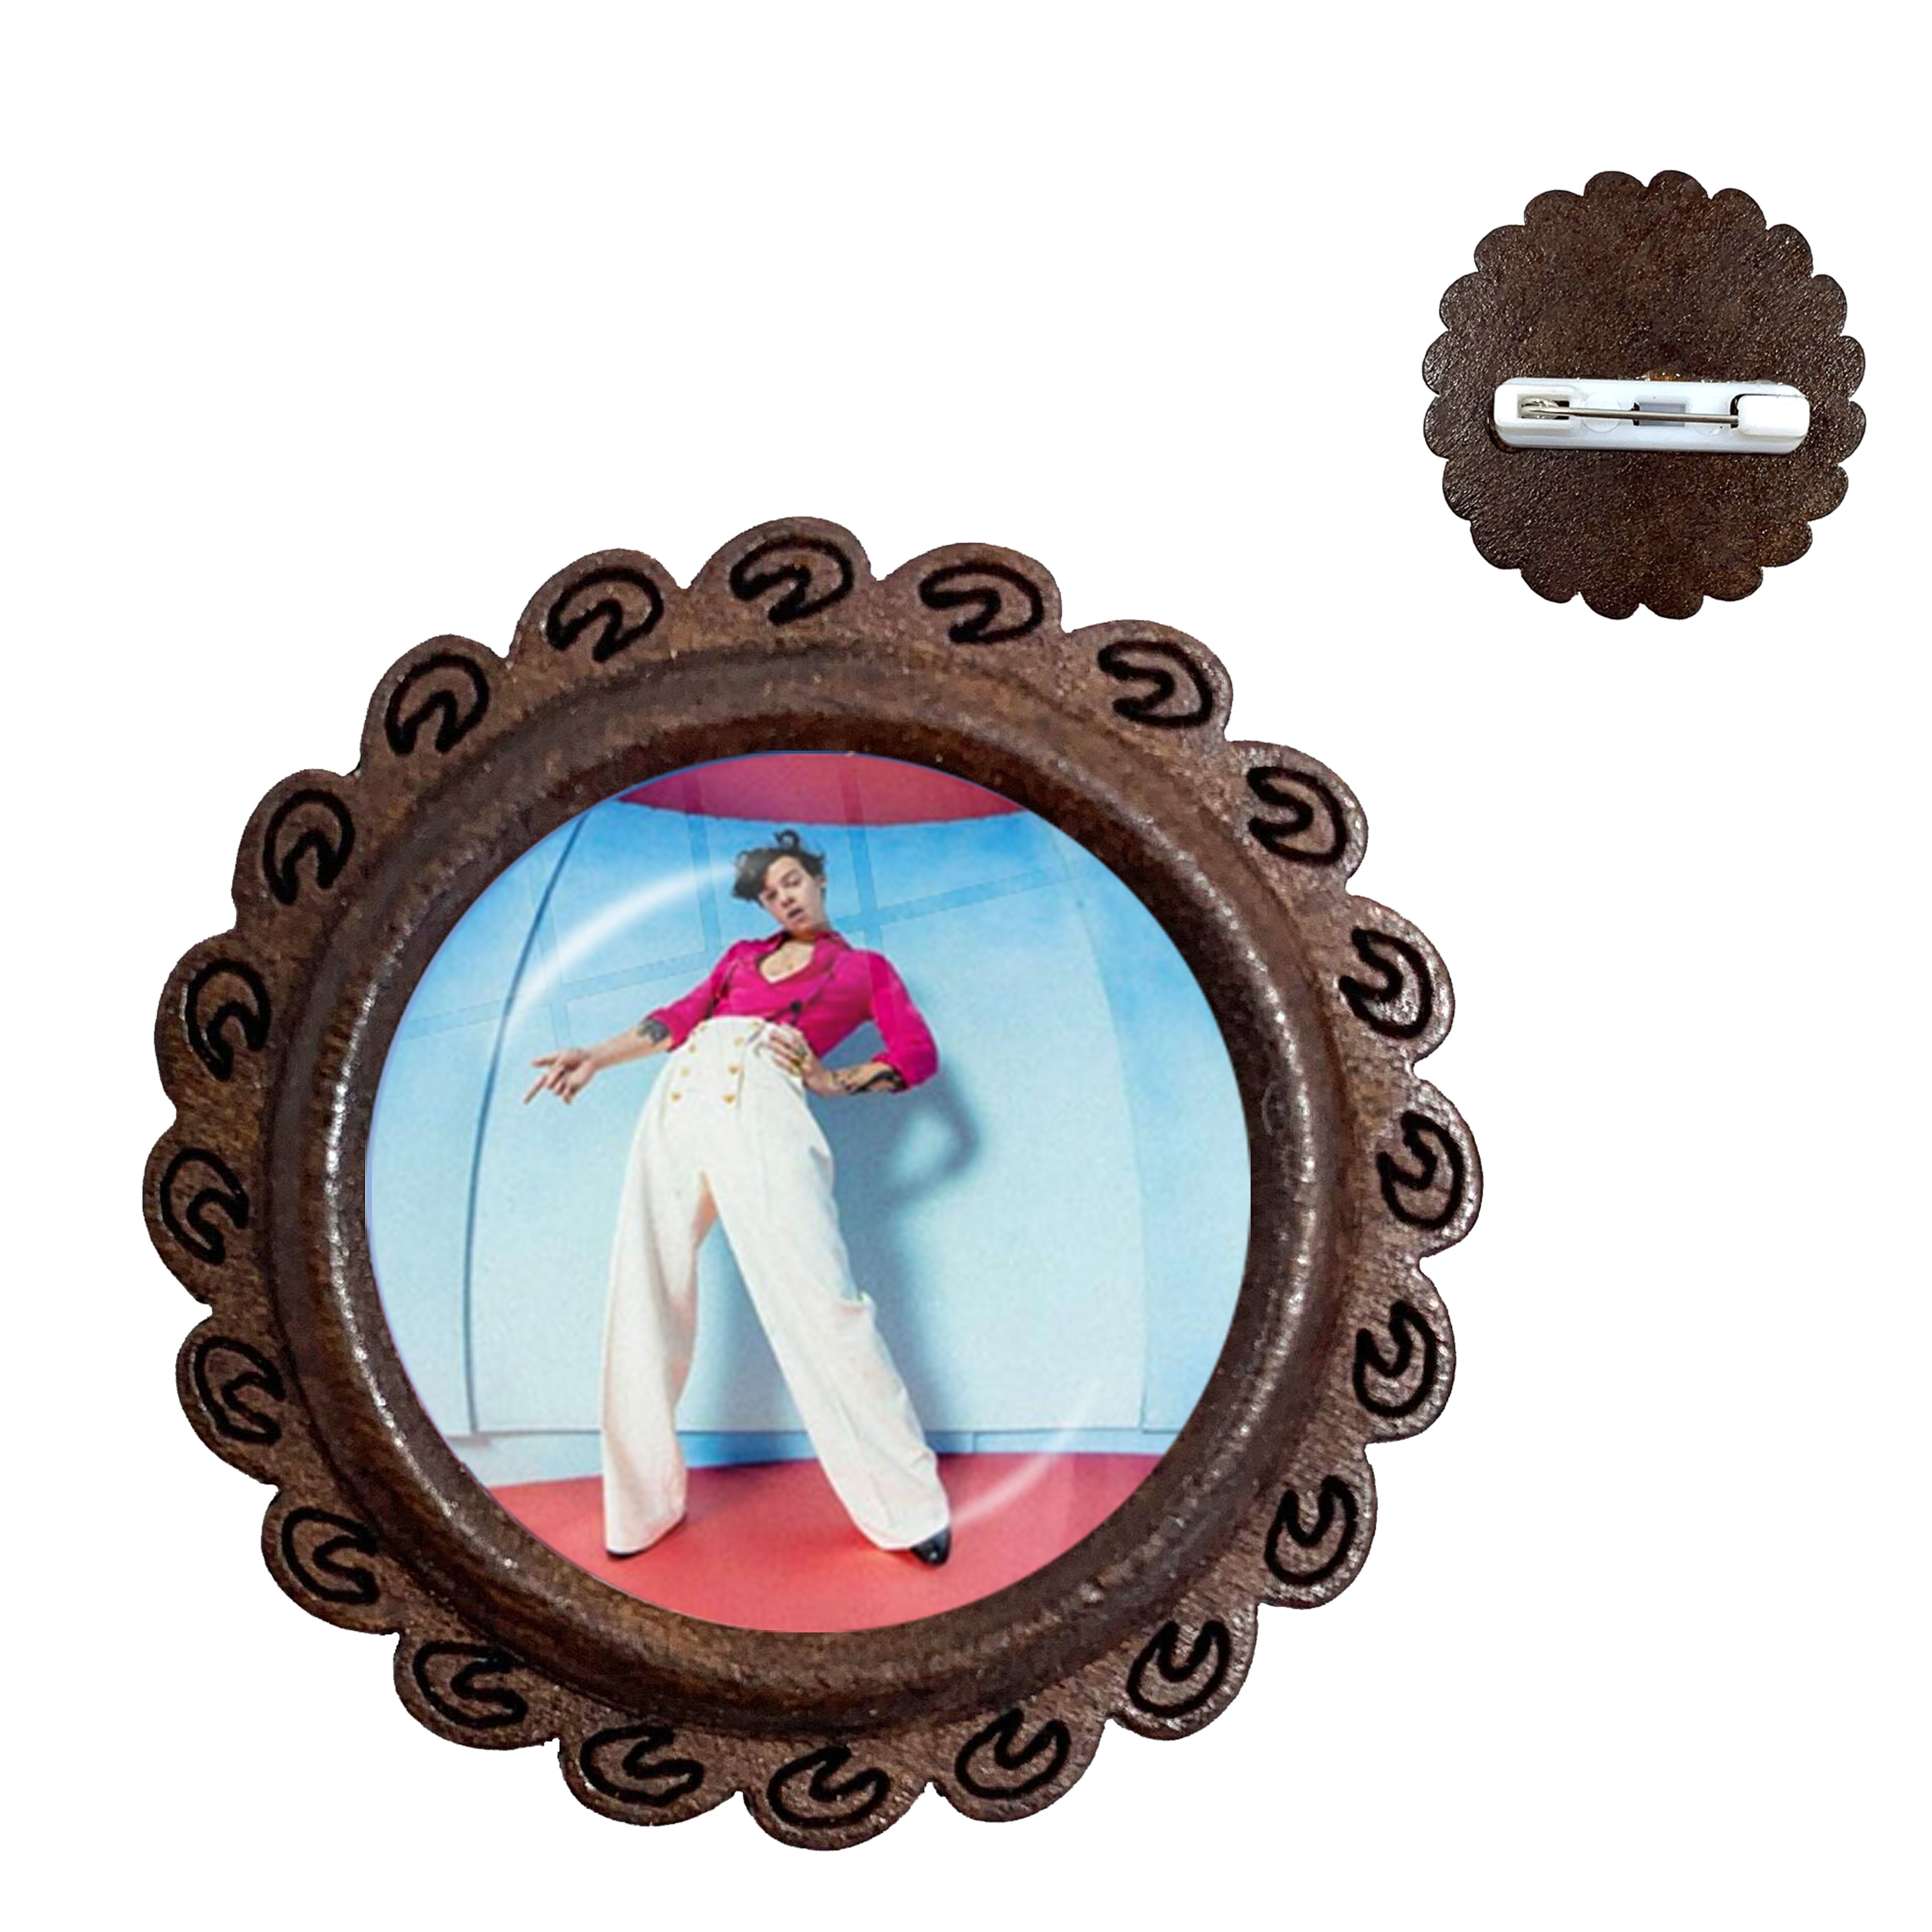 Broches de madera de estilo Harry, Love On Tour 2020, de línea fina, de 20mm, cristal, cabujón, Collar, pines, insignia, joyería para hombres y mujeres, regalo para seguidores